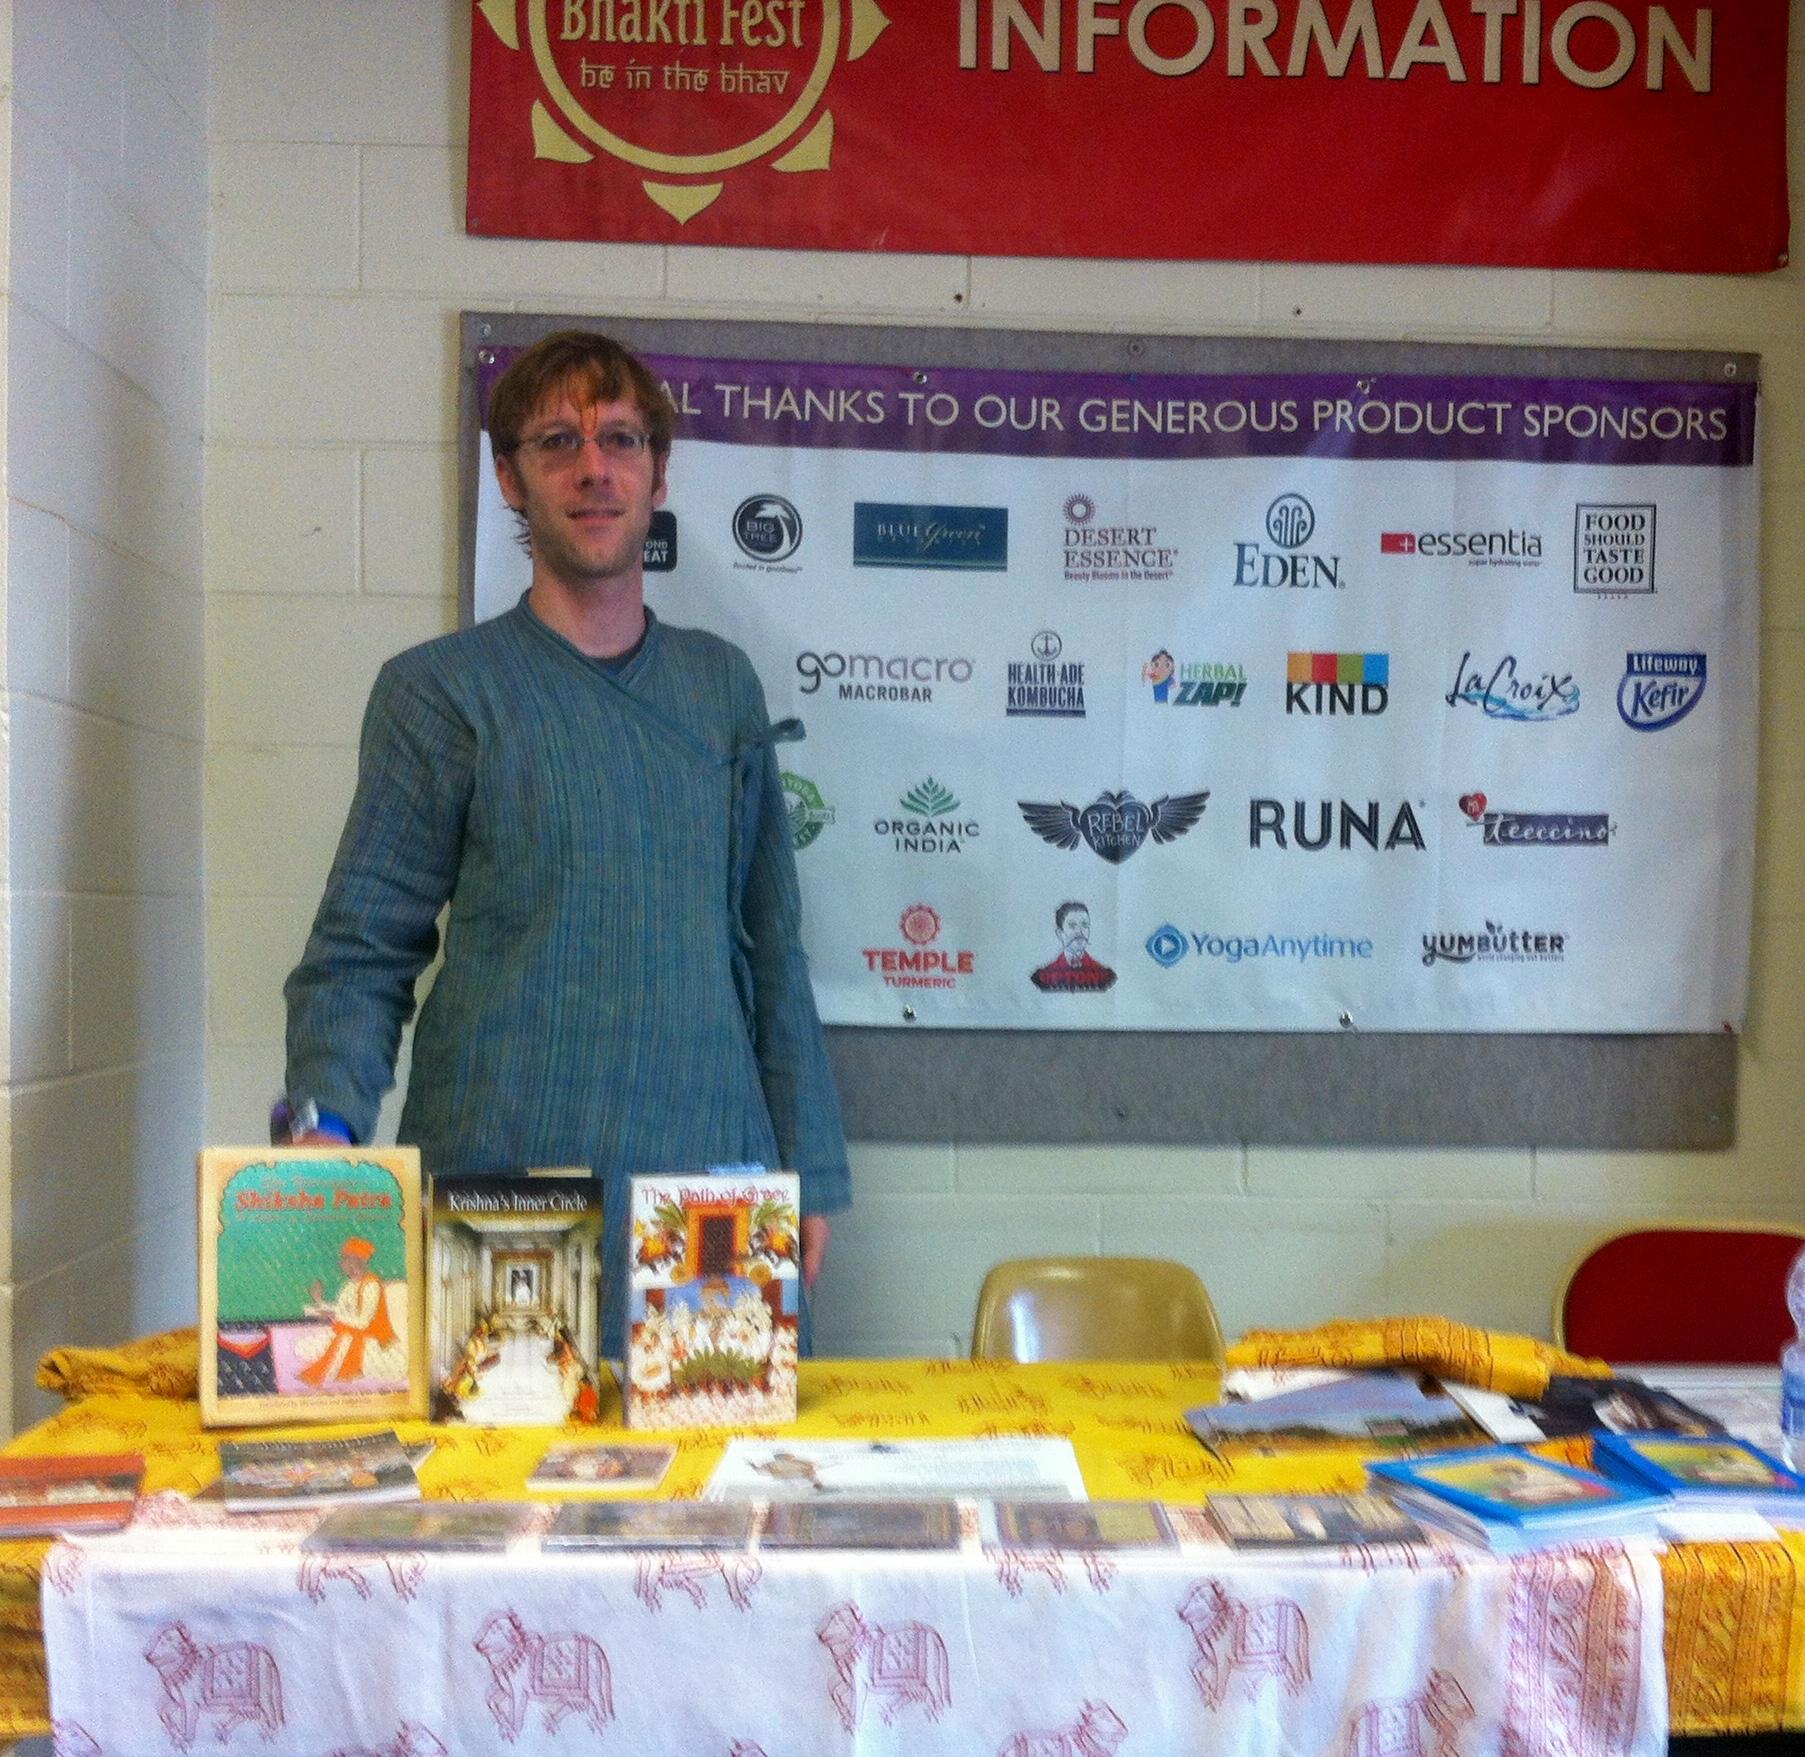 Bhaktifest Midwest 2015 Booth